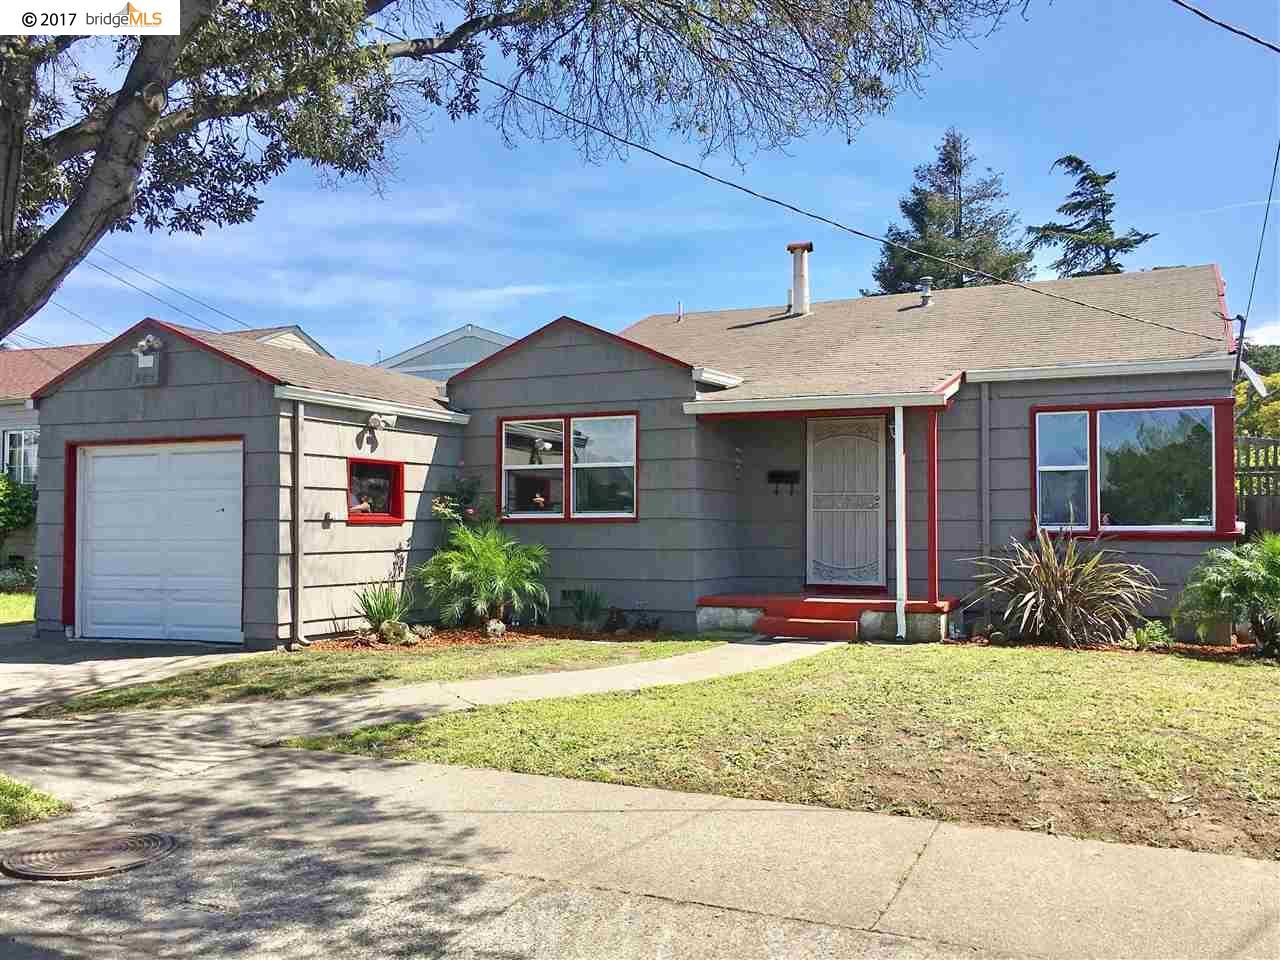 772 AMADOR ST, RICHMOND, CA 94805